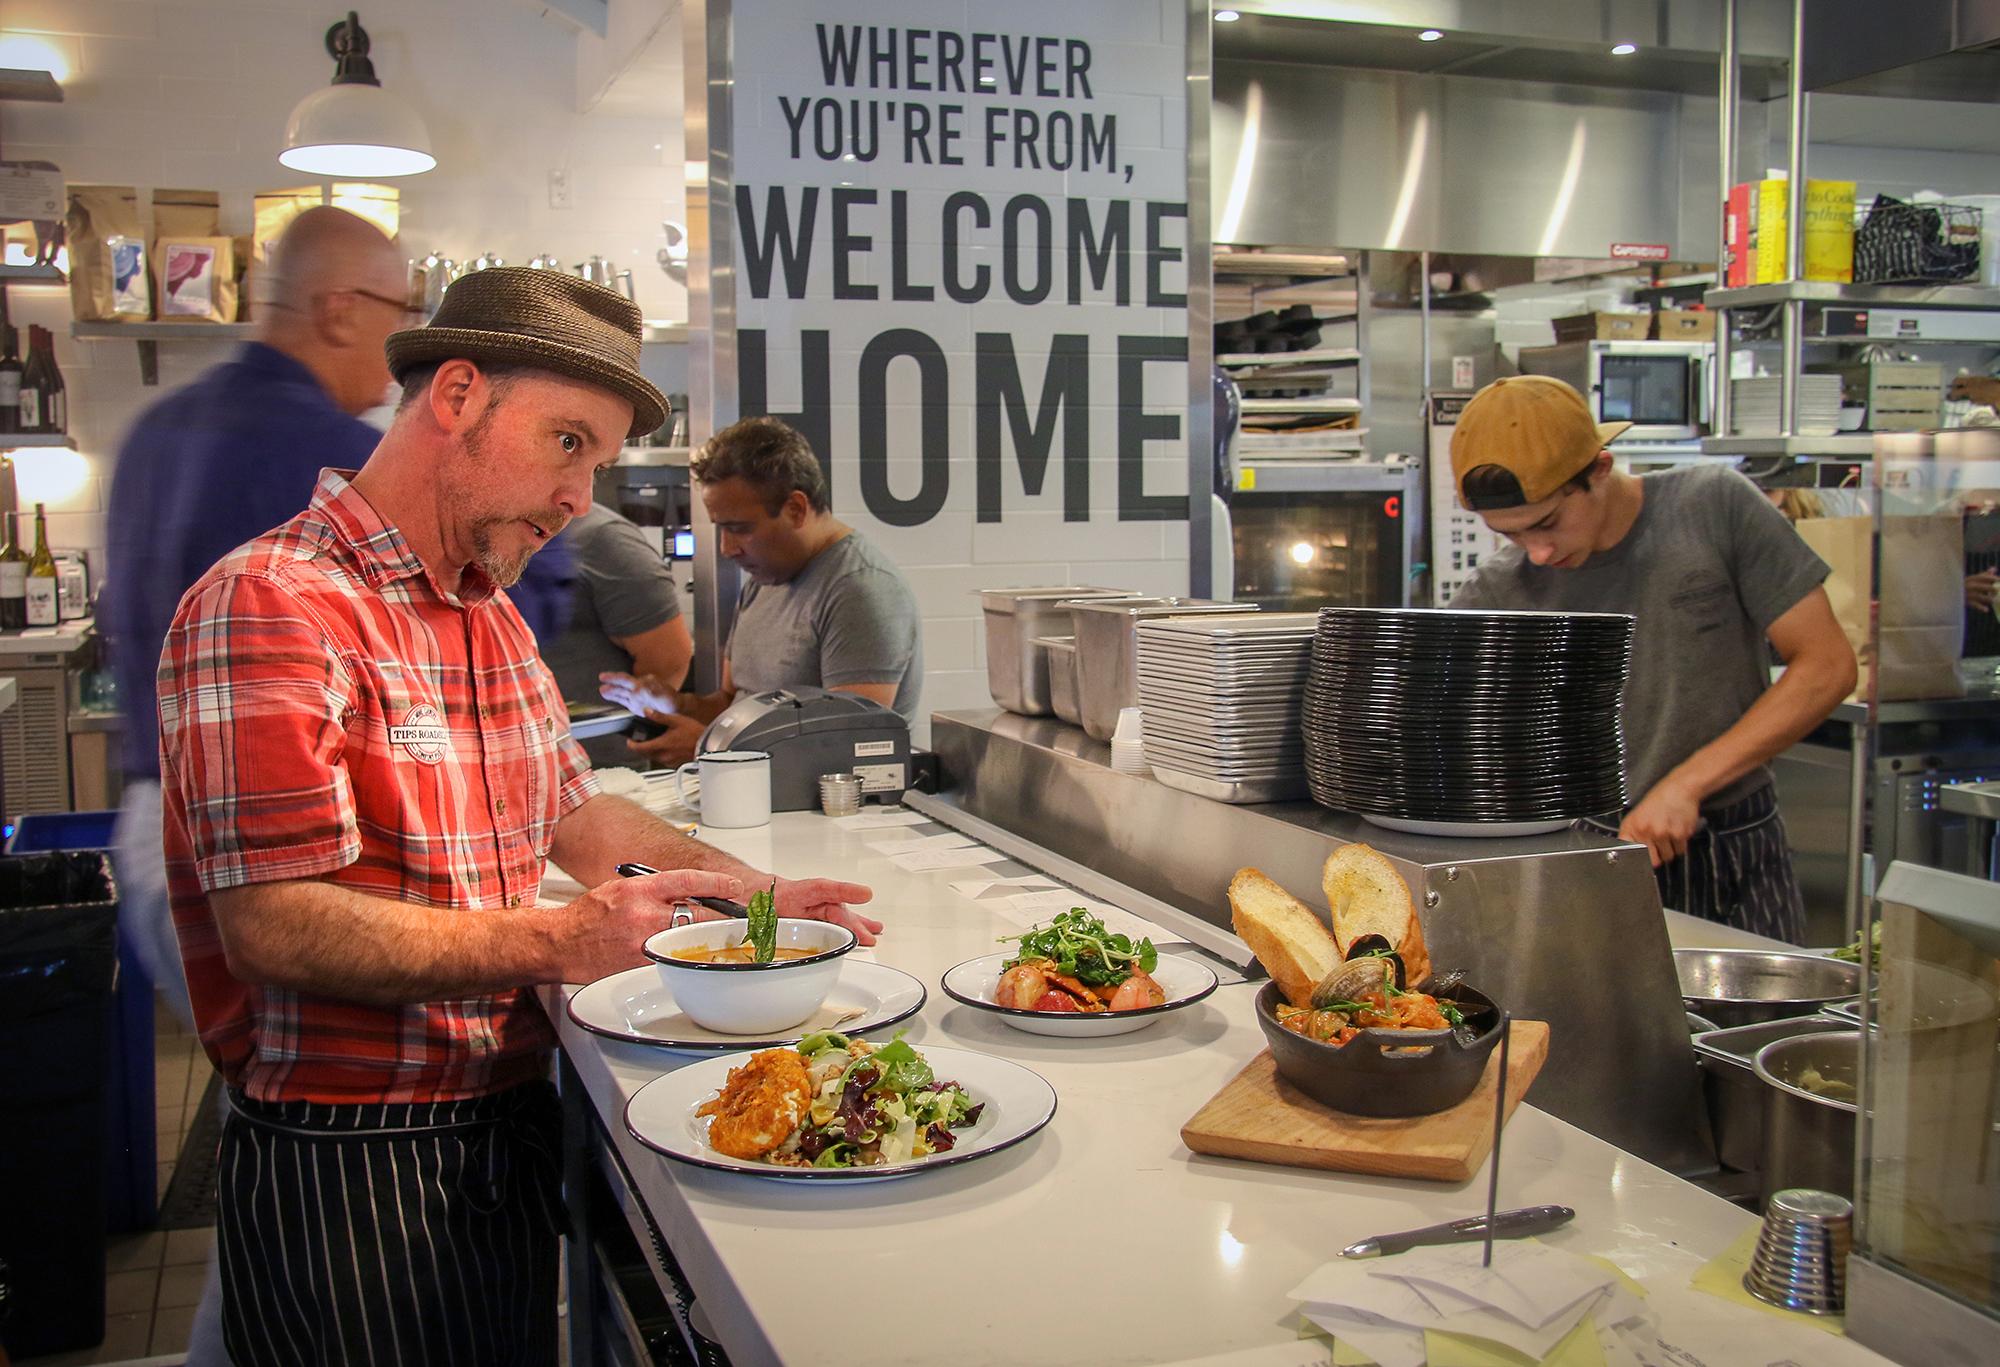 Chef Thaddeus Palmese expedites service at Tips Roadshouse in Kenwood. Heather Irwin, PD